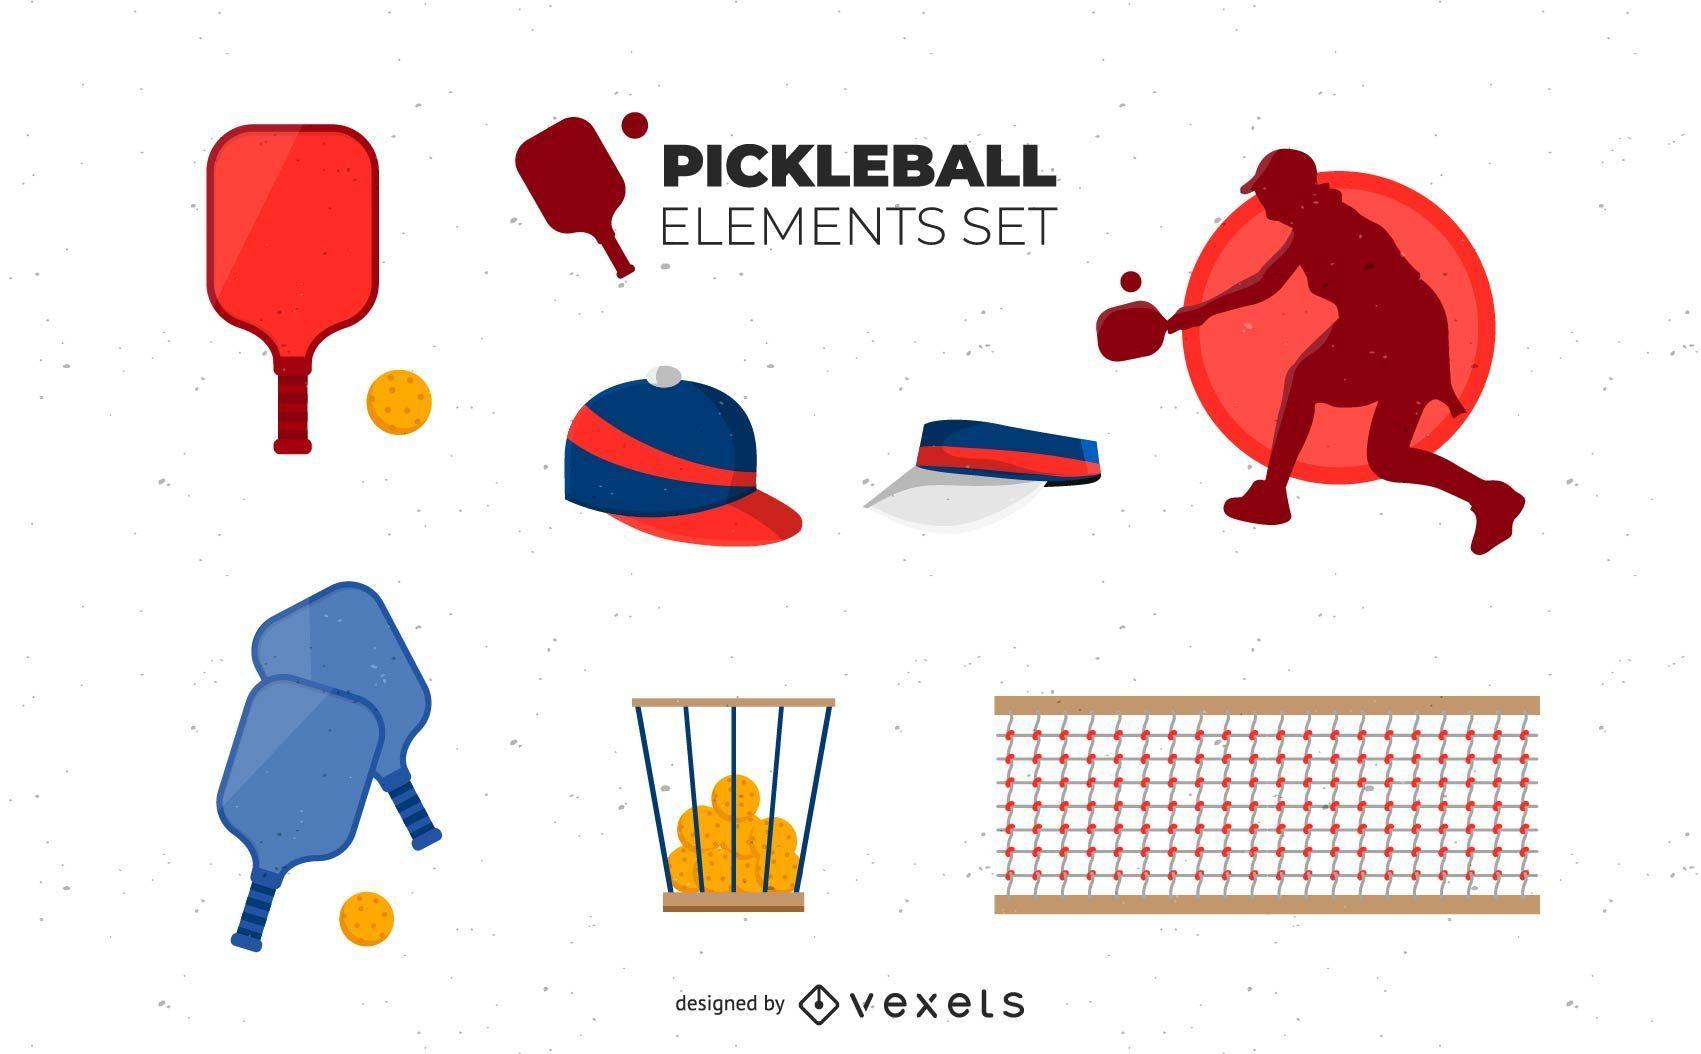 Pickleball Elements Set